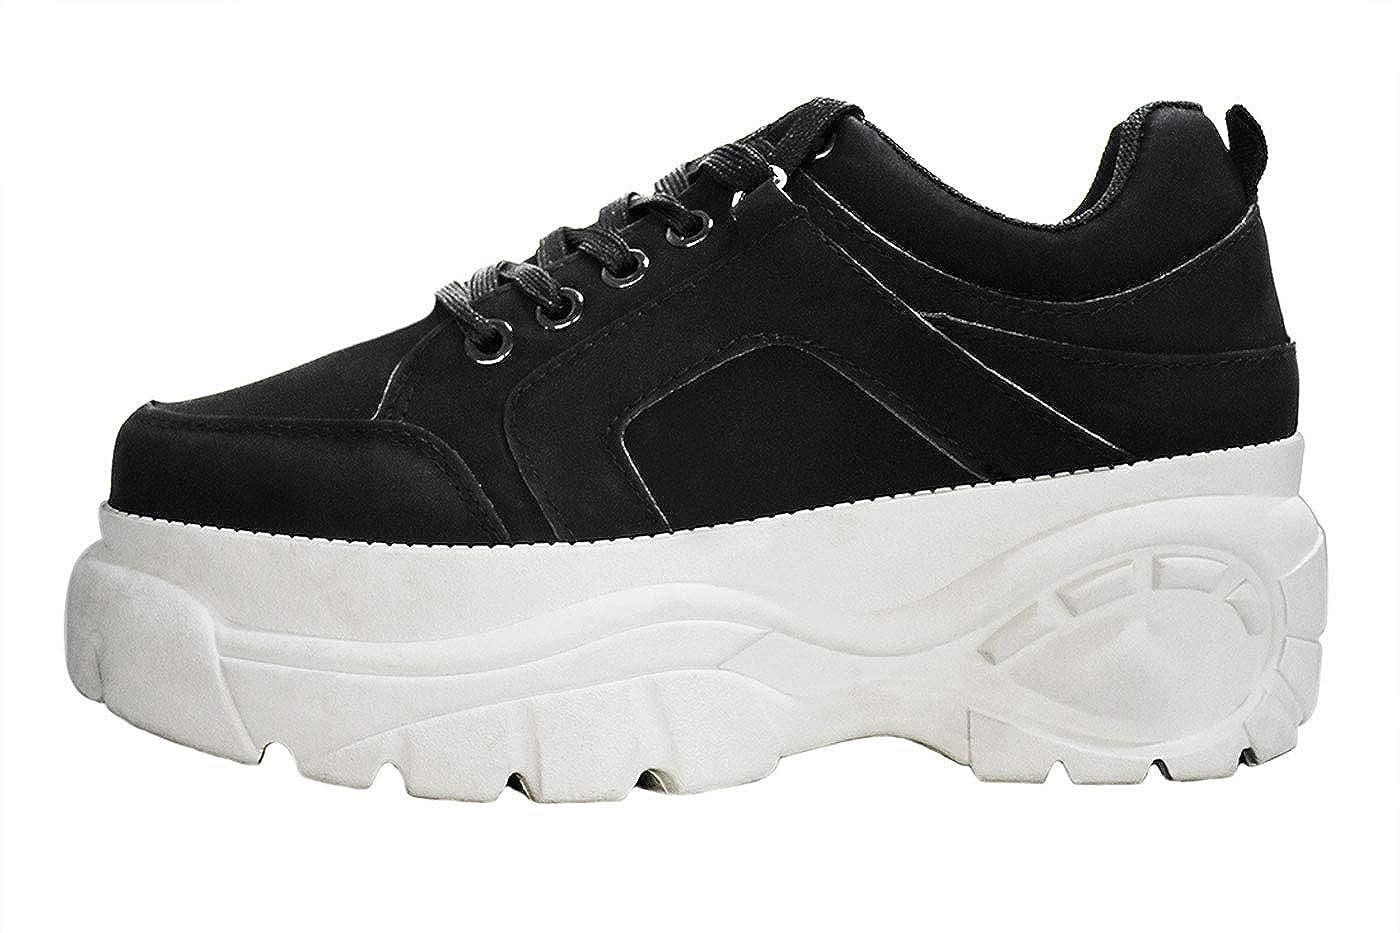 Women's Footwear Joggesko, sko og trenereJD Sports Joggesko, sko og trenere JD Sports